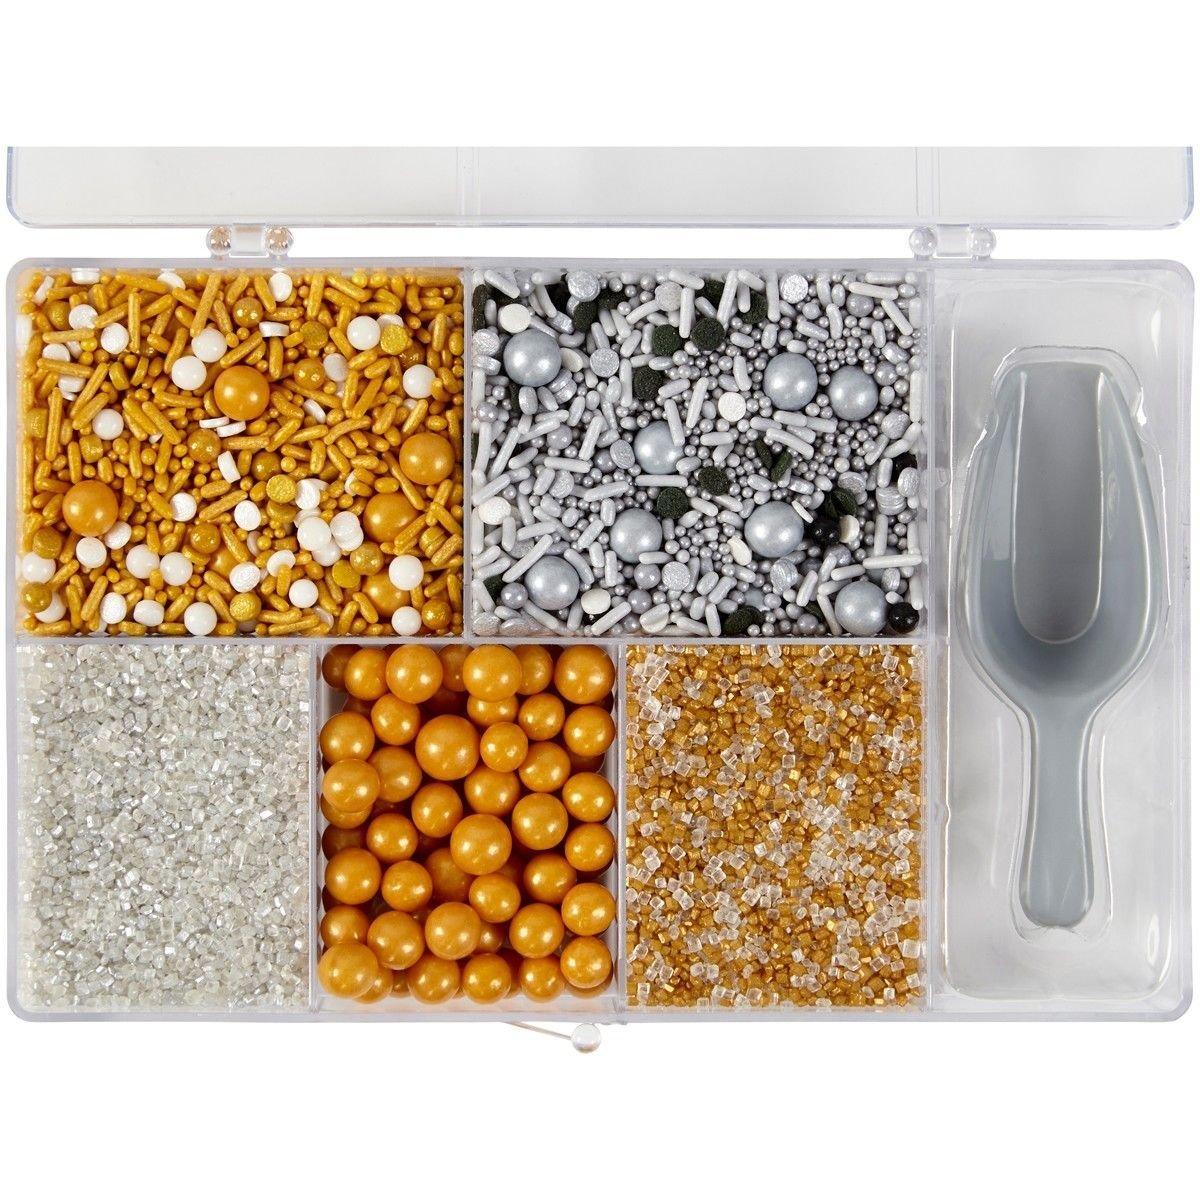 Wilton Christmas Sprinkles -Tackle Box Metallic 5 διαφορετικές βρώσιμες ζαχαρένιες διακοσμητικές λιχουδιές σε κουτάκι